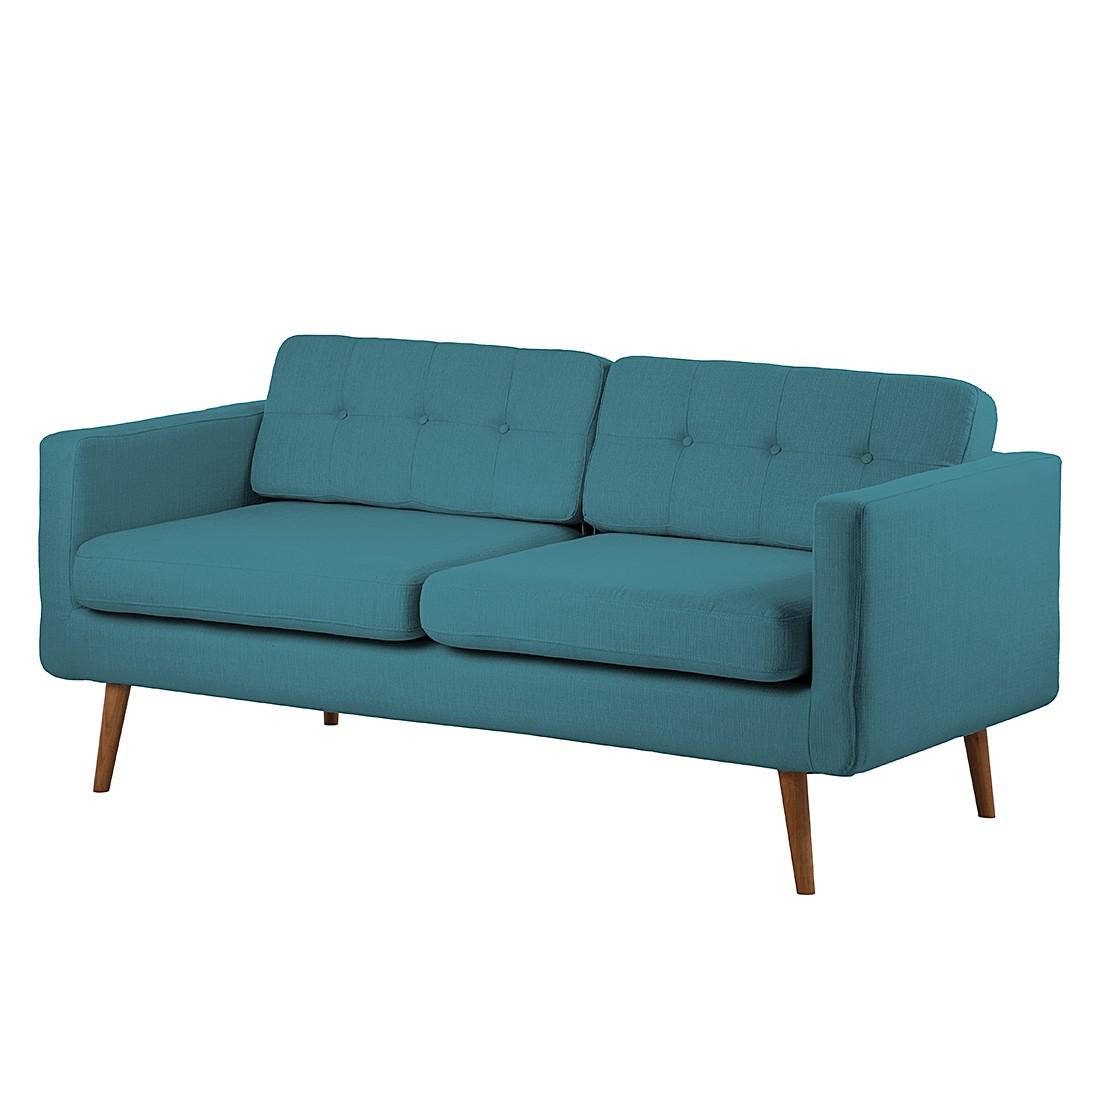 Morteens Sofa Croom (3-Sitzer) - Webstoff - Türkis